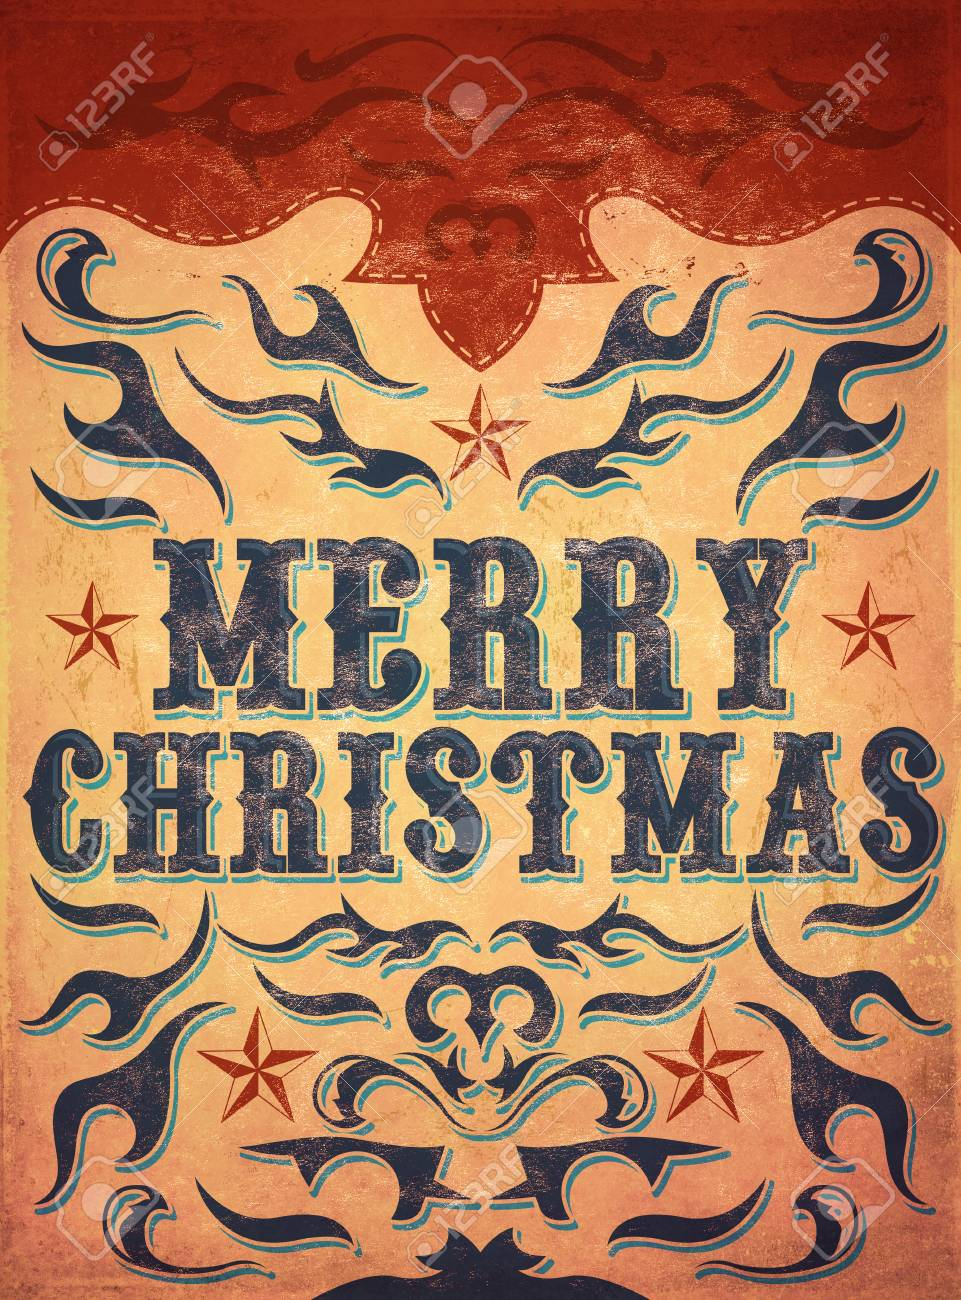 Old Sign, Vintage Merry Christmas Poster - Wild Western Illustration ...